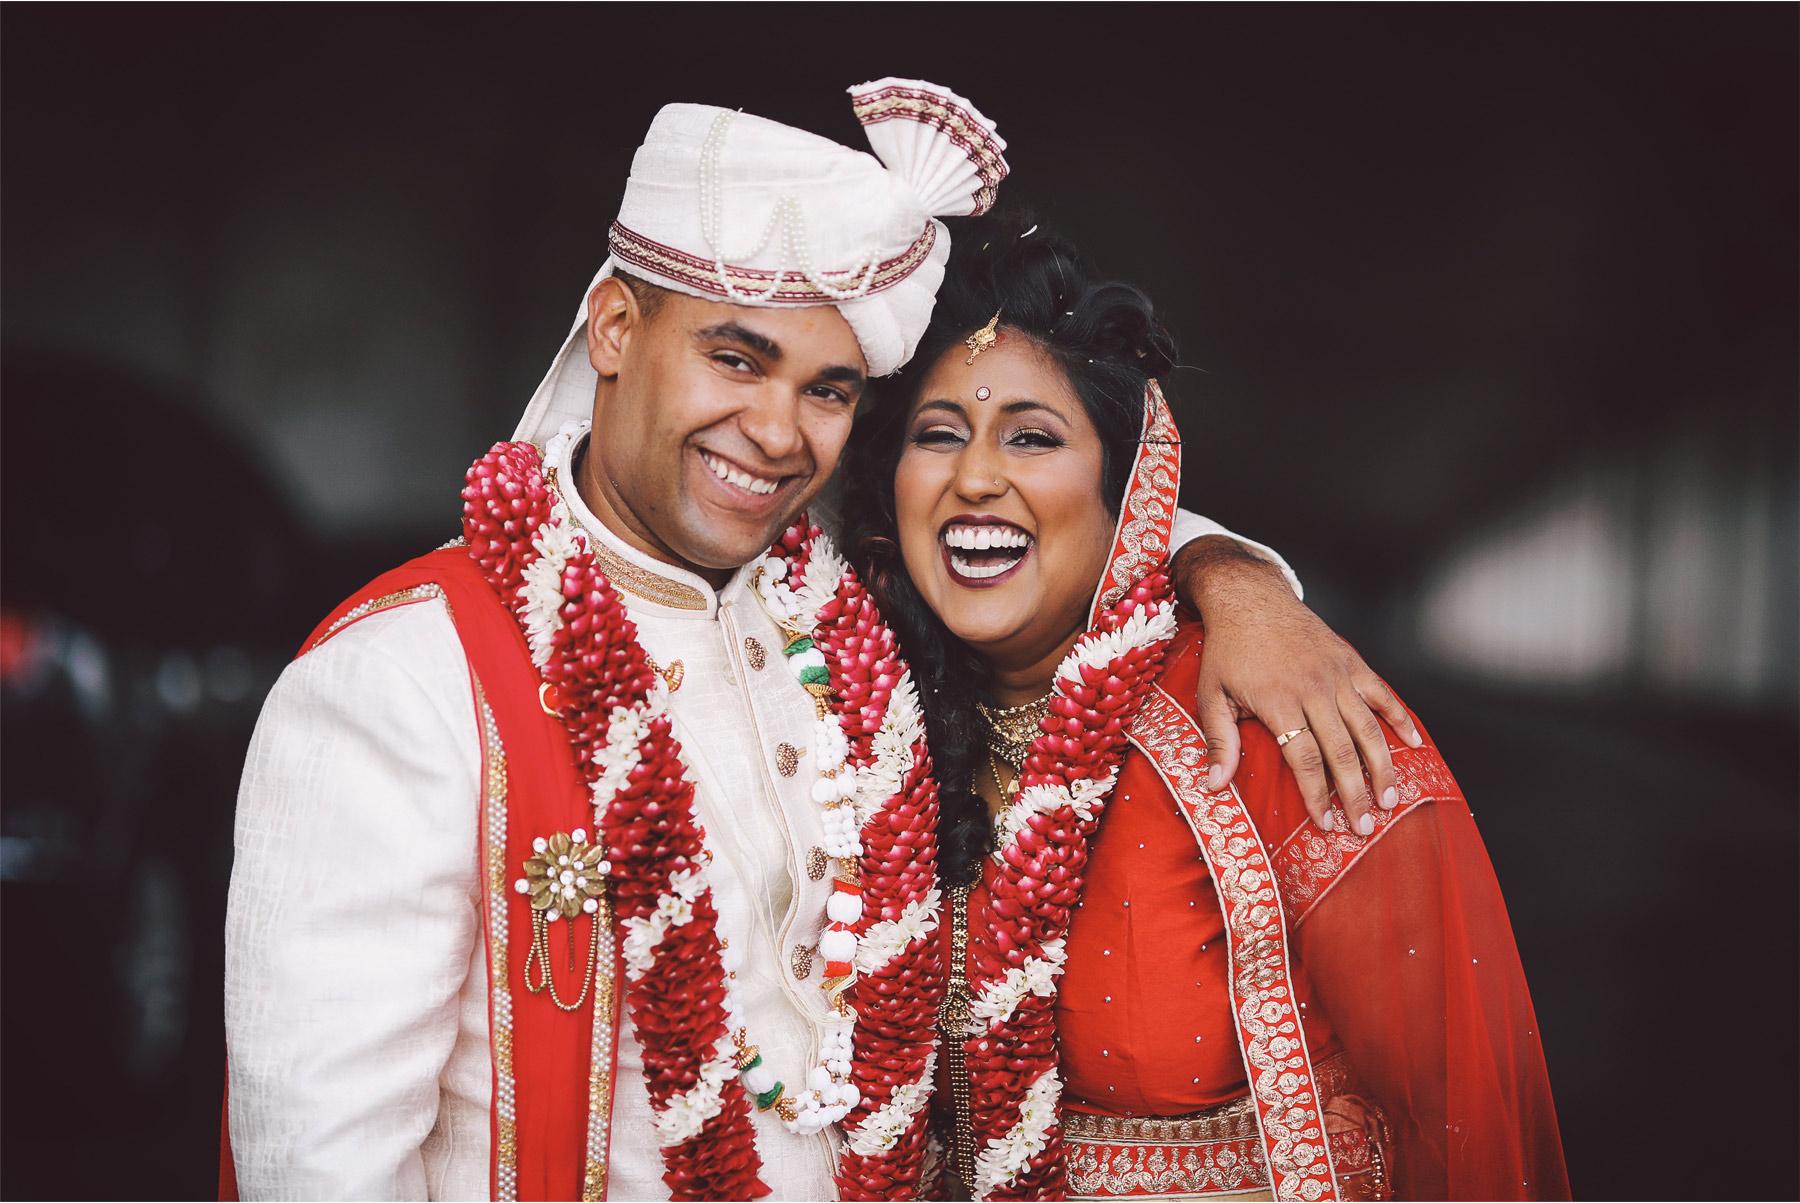 17-St-Paul-Minnesota-Wedding-Photography-by-Vick-Photography-Happy-Bride-and-Groom-Leena-and-Michael.jpg